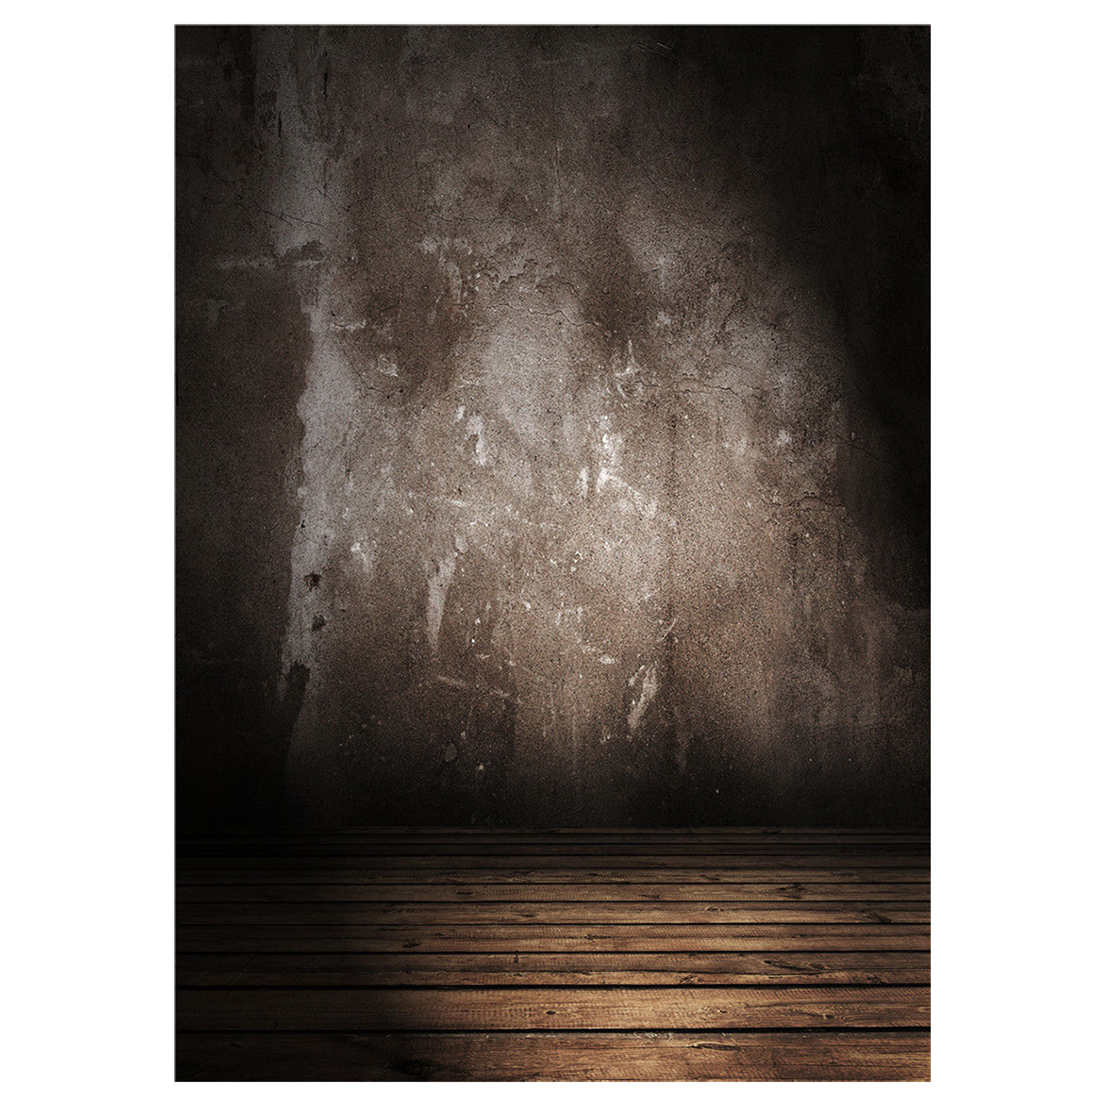 SCLS Retro Background Wood Floor Photo Studio Props Photography Backdrops Vinyl 5x7FT photography backdrops children photo studio props wood floor vinyl background for baby 5x7ft or 3x5ft jiejp001